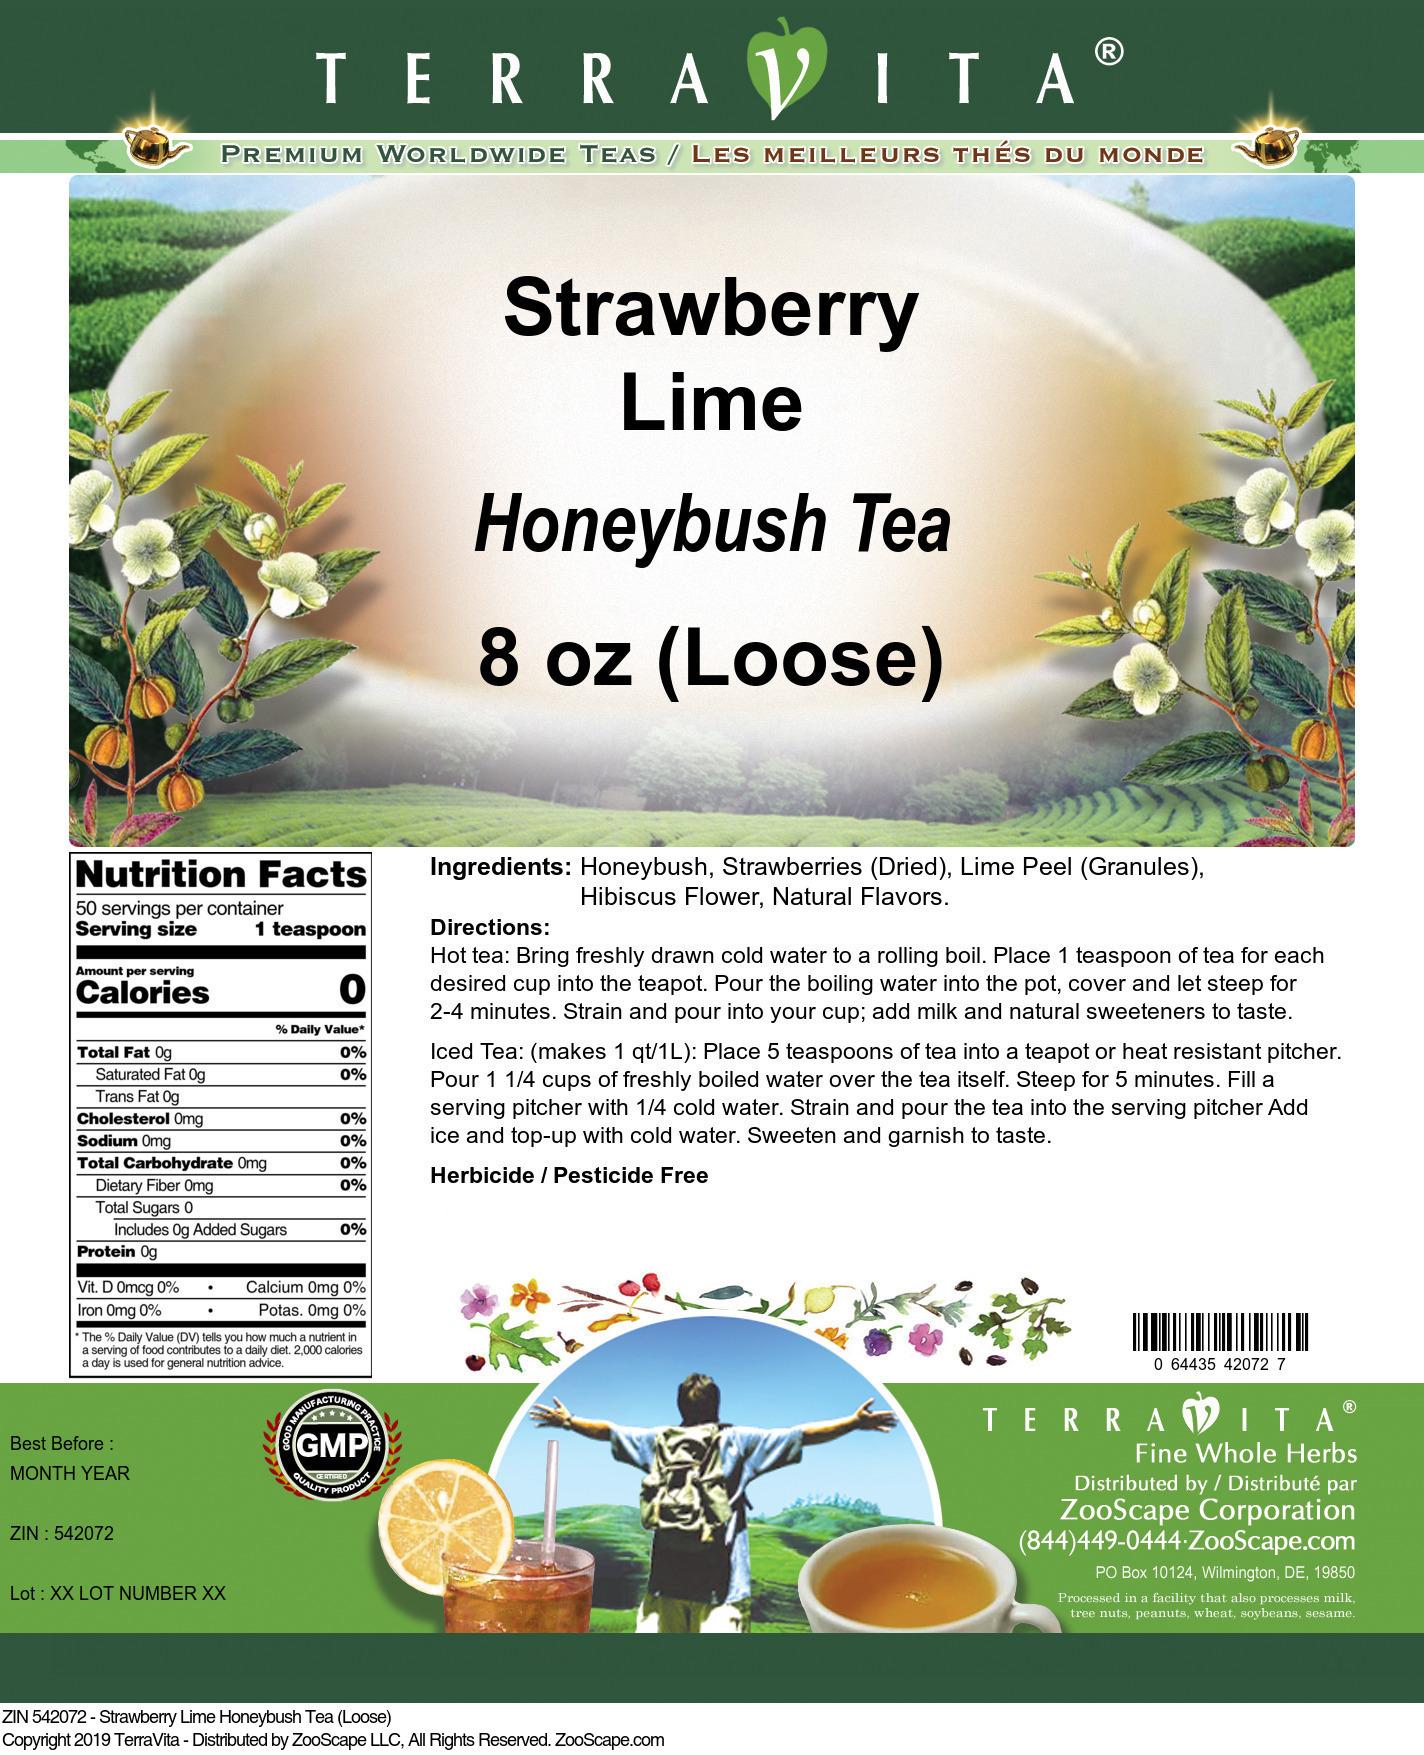 Strawberry Lime Honeybush Tea